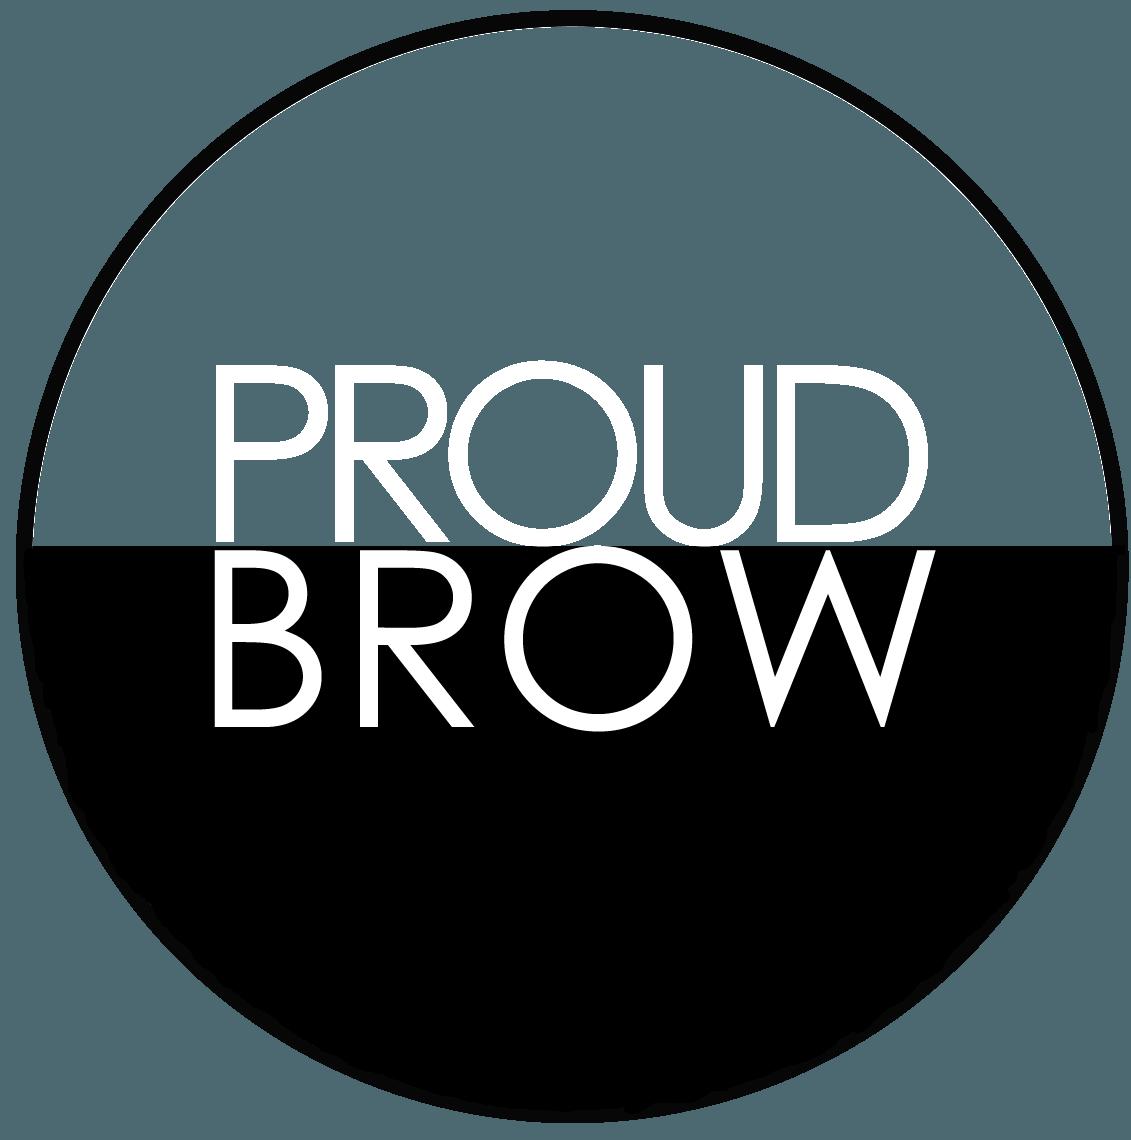 Proud Brow